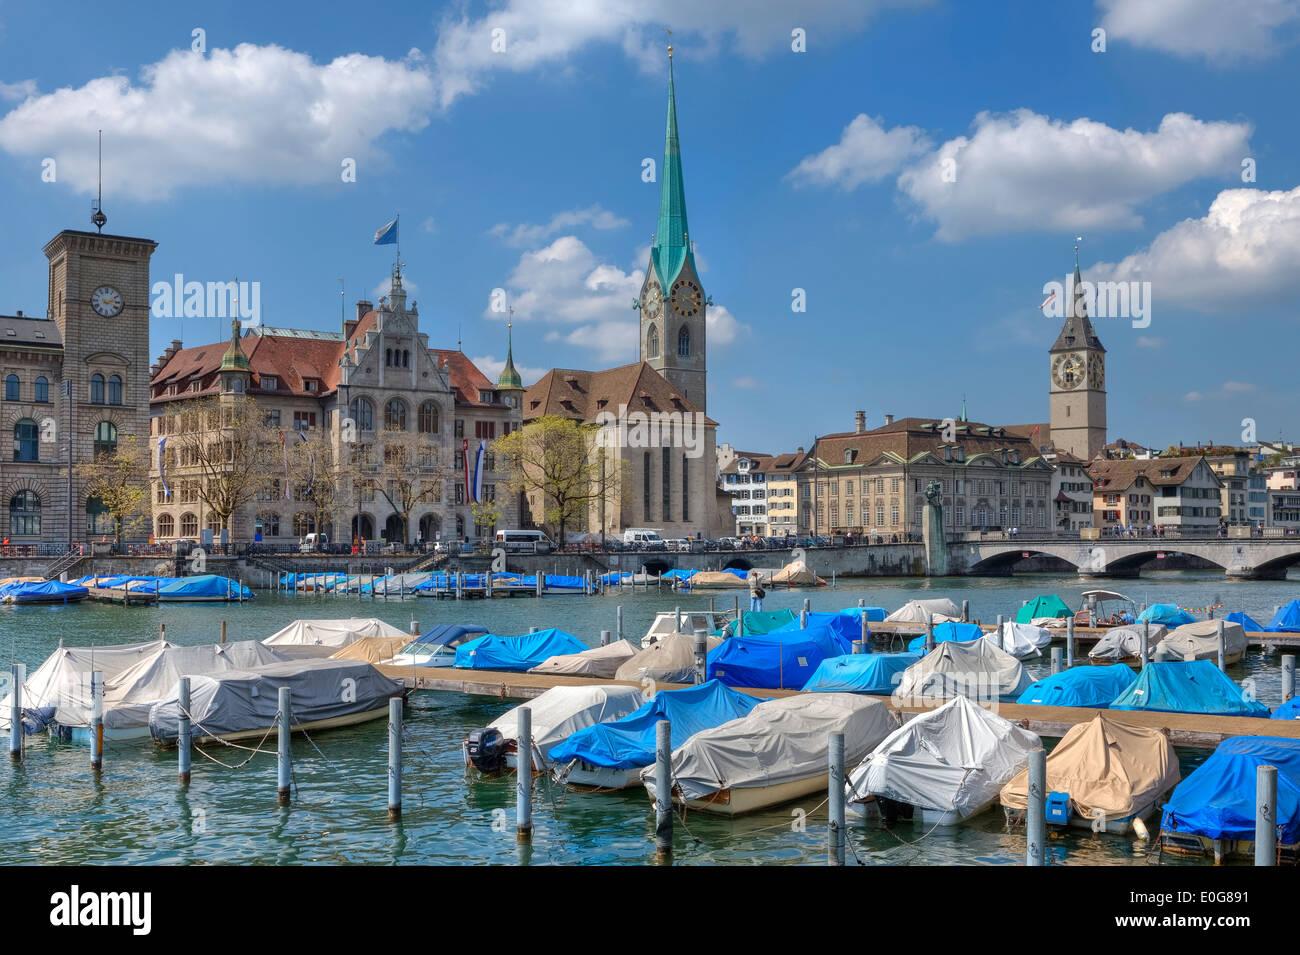 Zurigo, città vecchia, Svizzera Immagini Stock